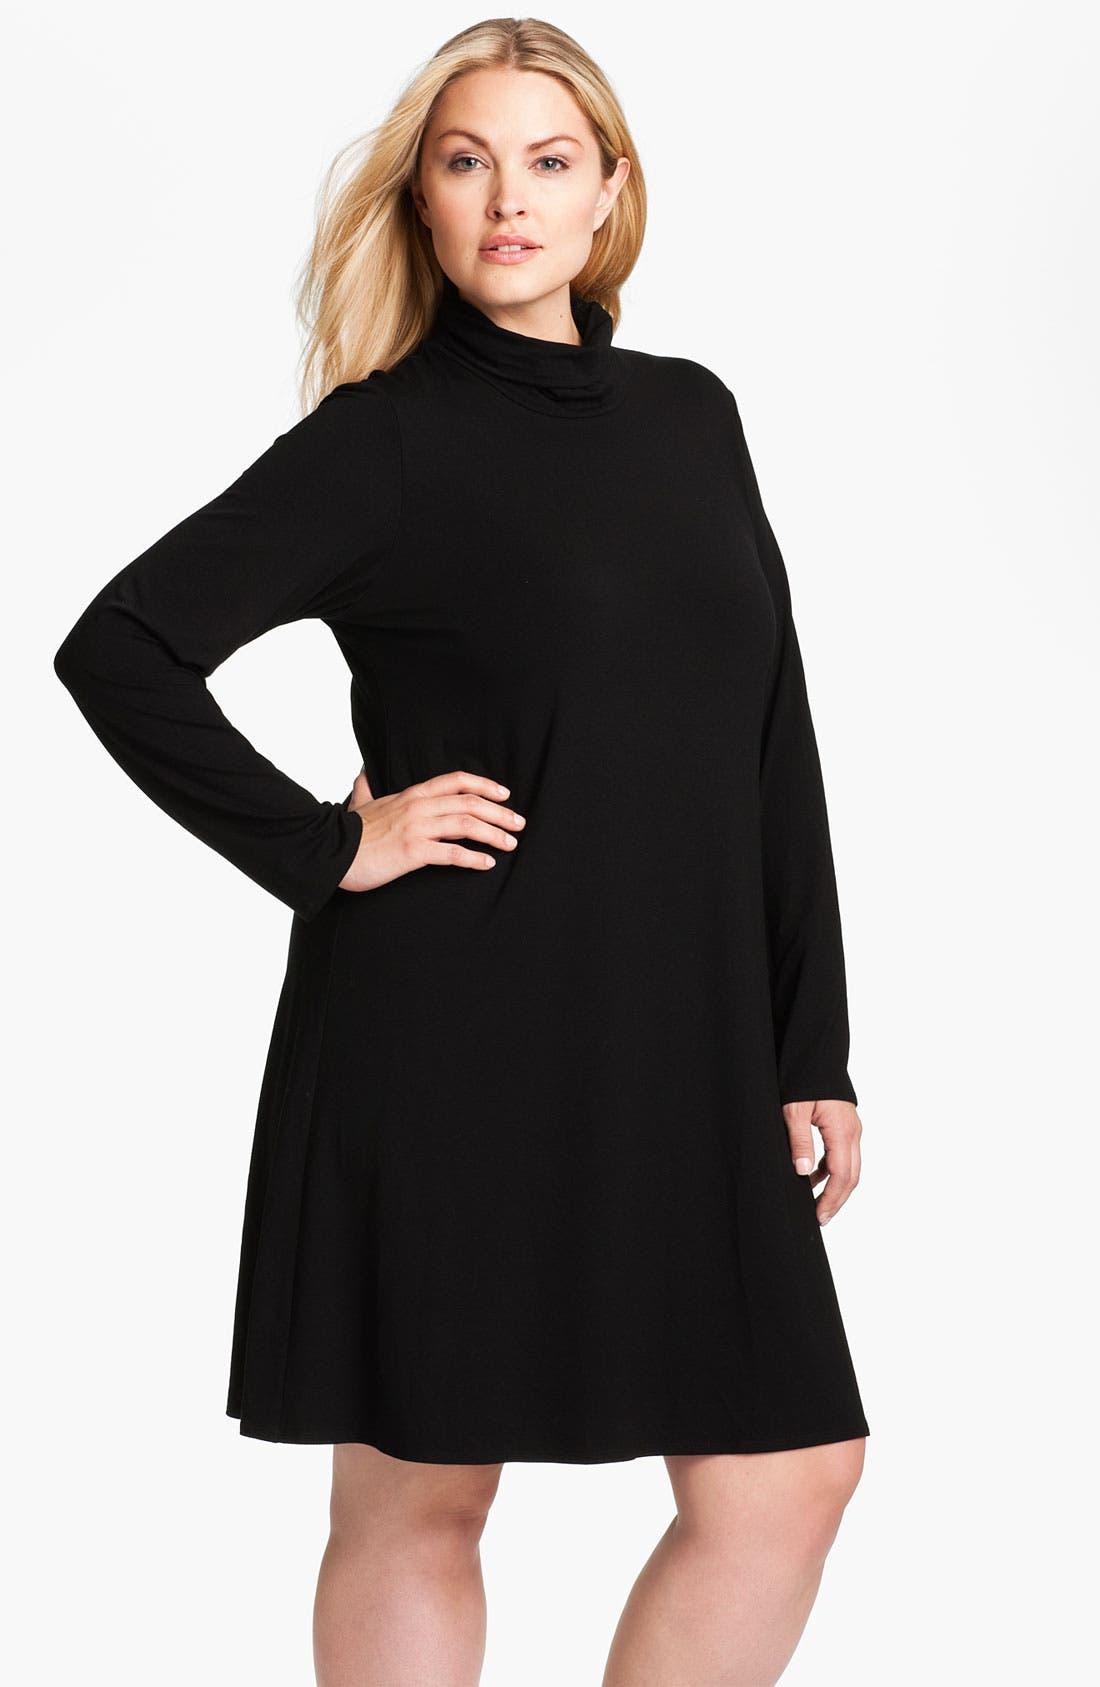 Alternate Image 1 Selected - Eileen Fisher Scrunch Neck Dress (Plus)